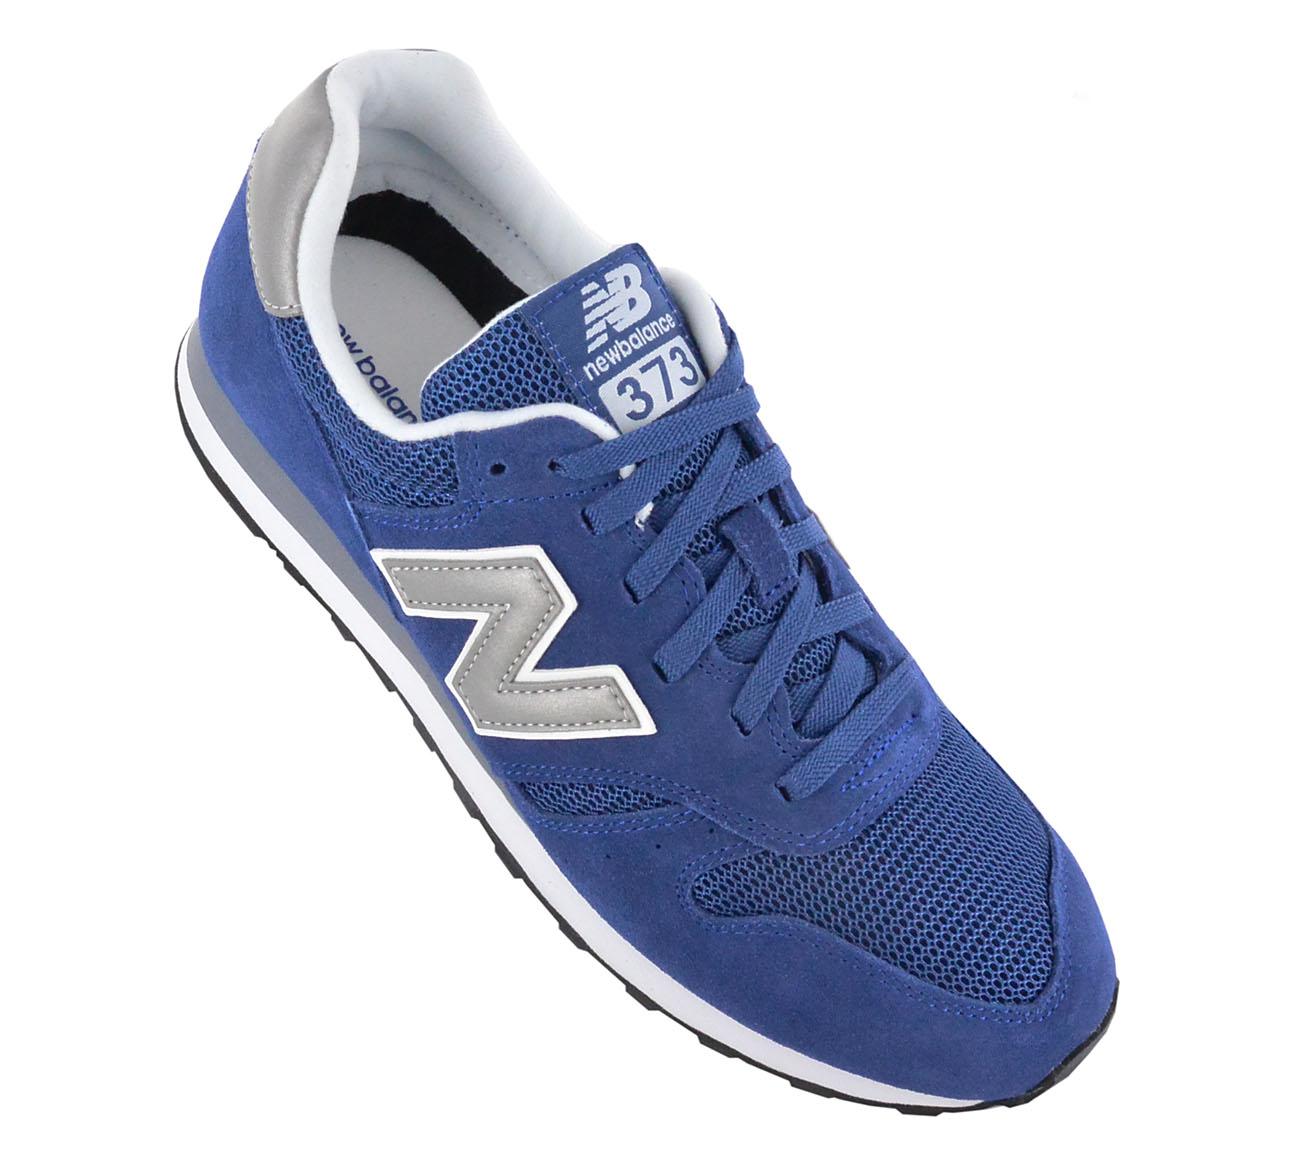 ded37b2e219225 Sneakers Classics 373 Casual Trainers New Shoes Men s Blue Balance qtxgxTnvF